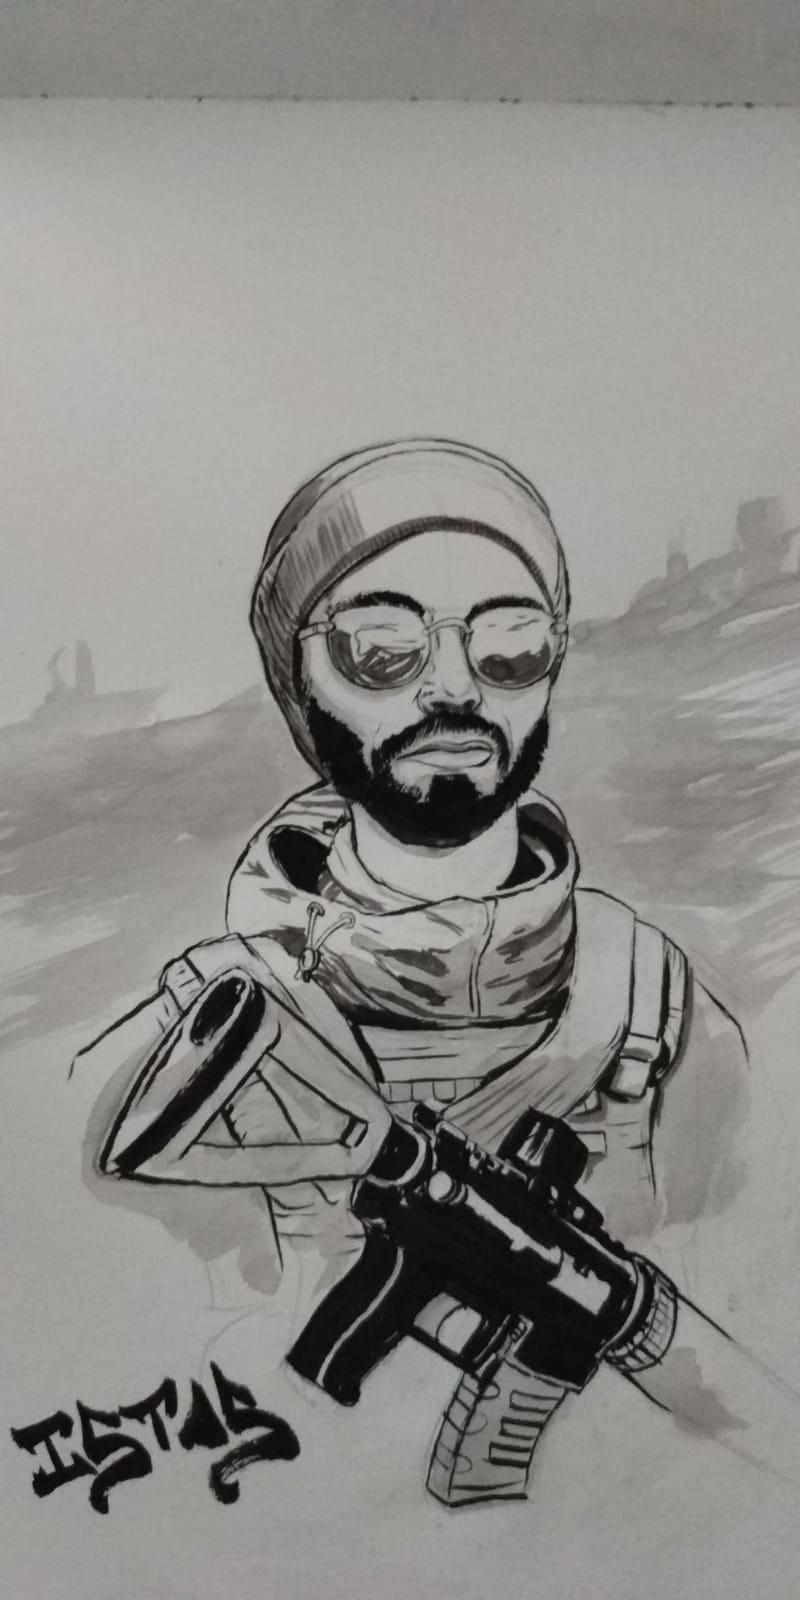 ArtStation - Reddit assignment 3, Michael Tartour